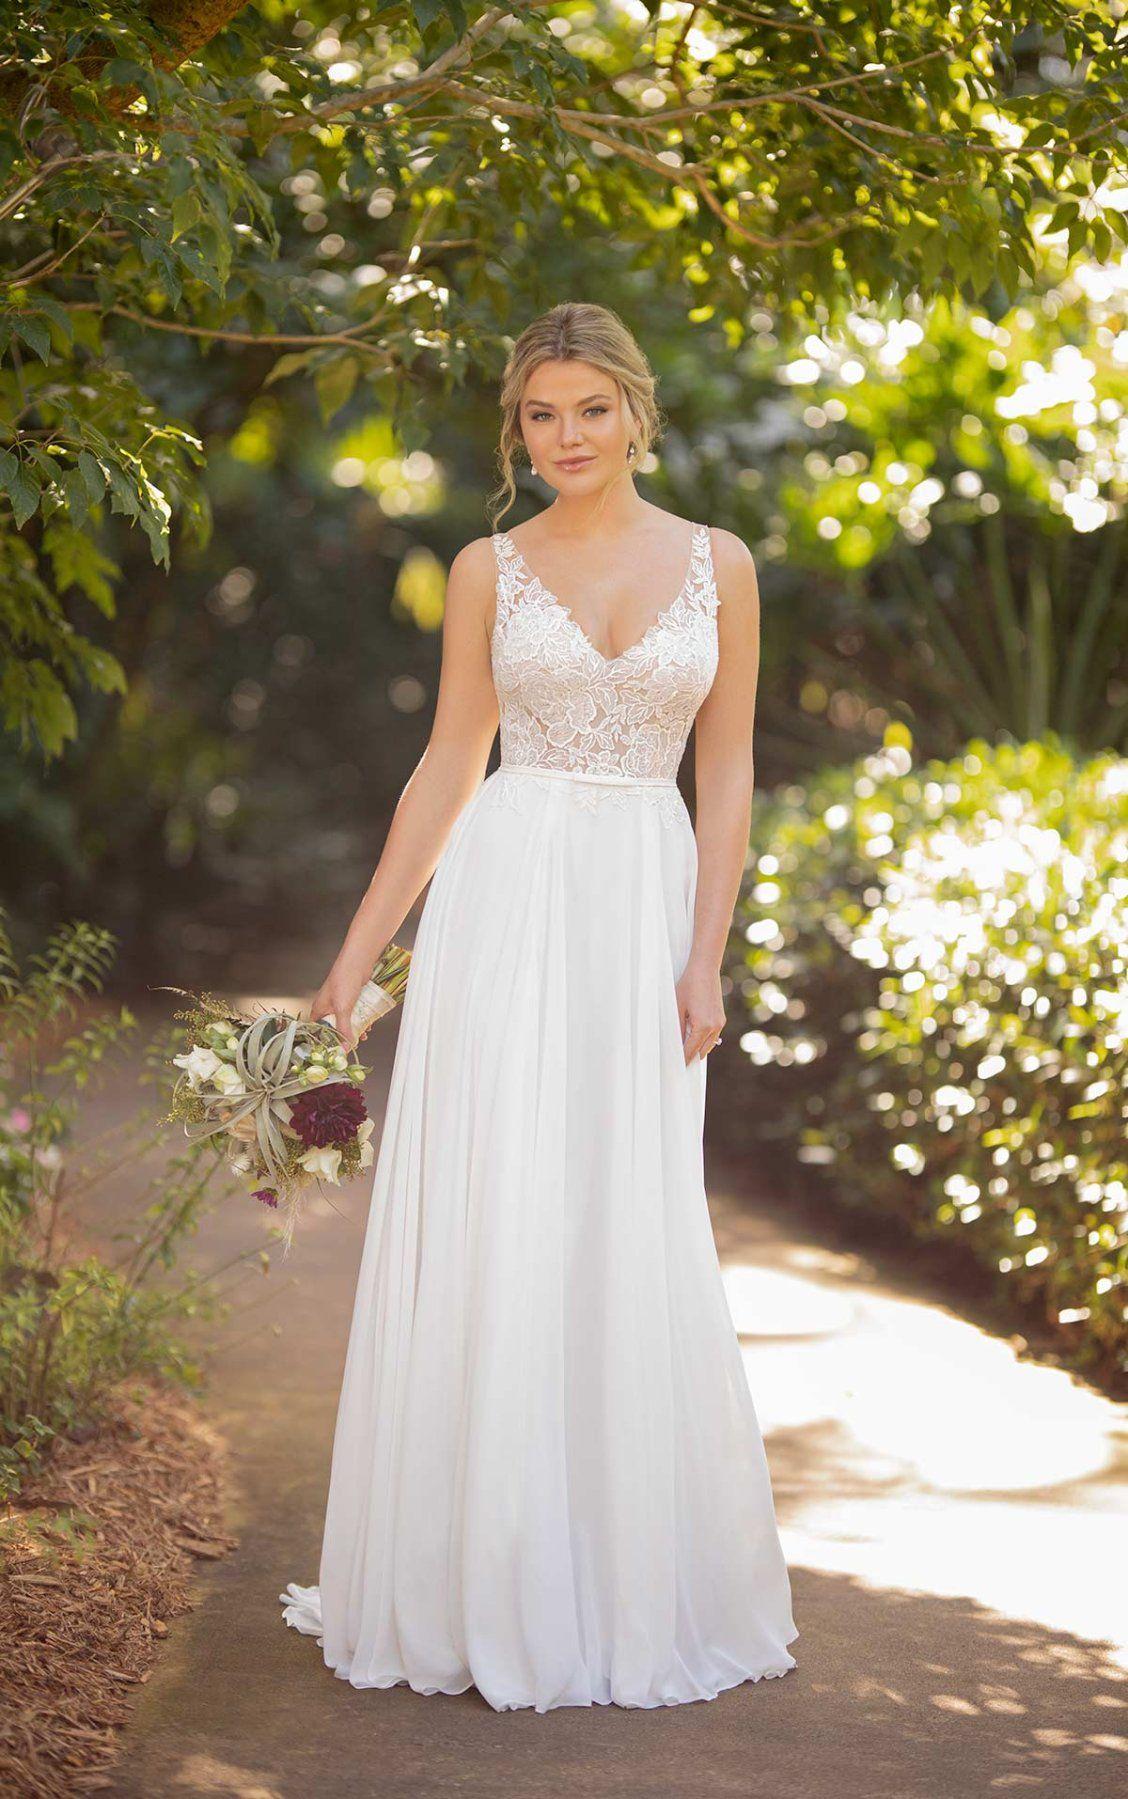 Lace And Chiffon Wedding Dress With Detachable Belt Essense Of Australia Wedding Dresses Essense Of Australia Wedding Dresses Wedding Dresses A Line Wedding Dress [ 1799 x 1128 Pixel ]